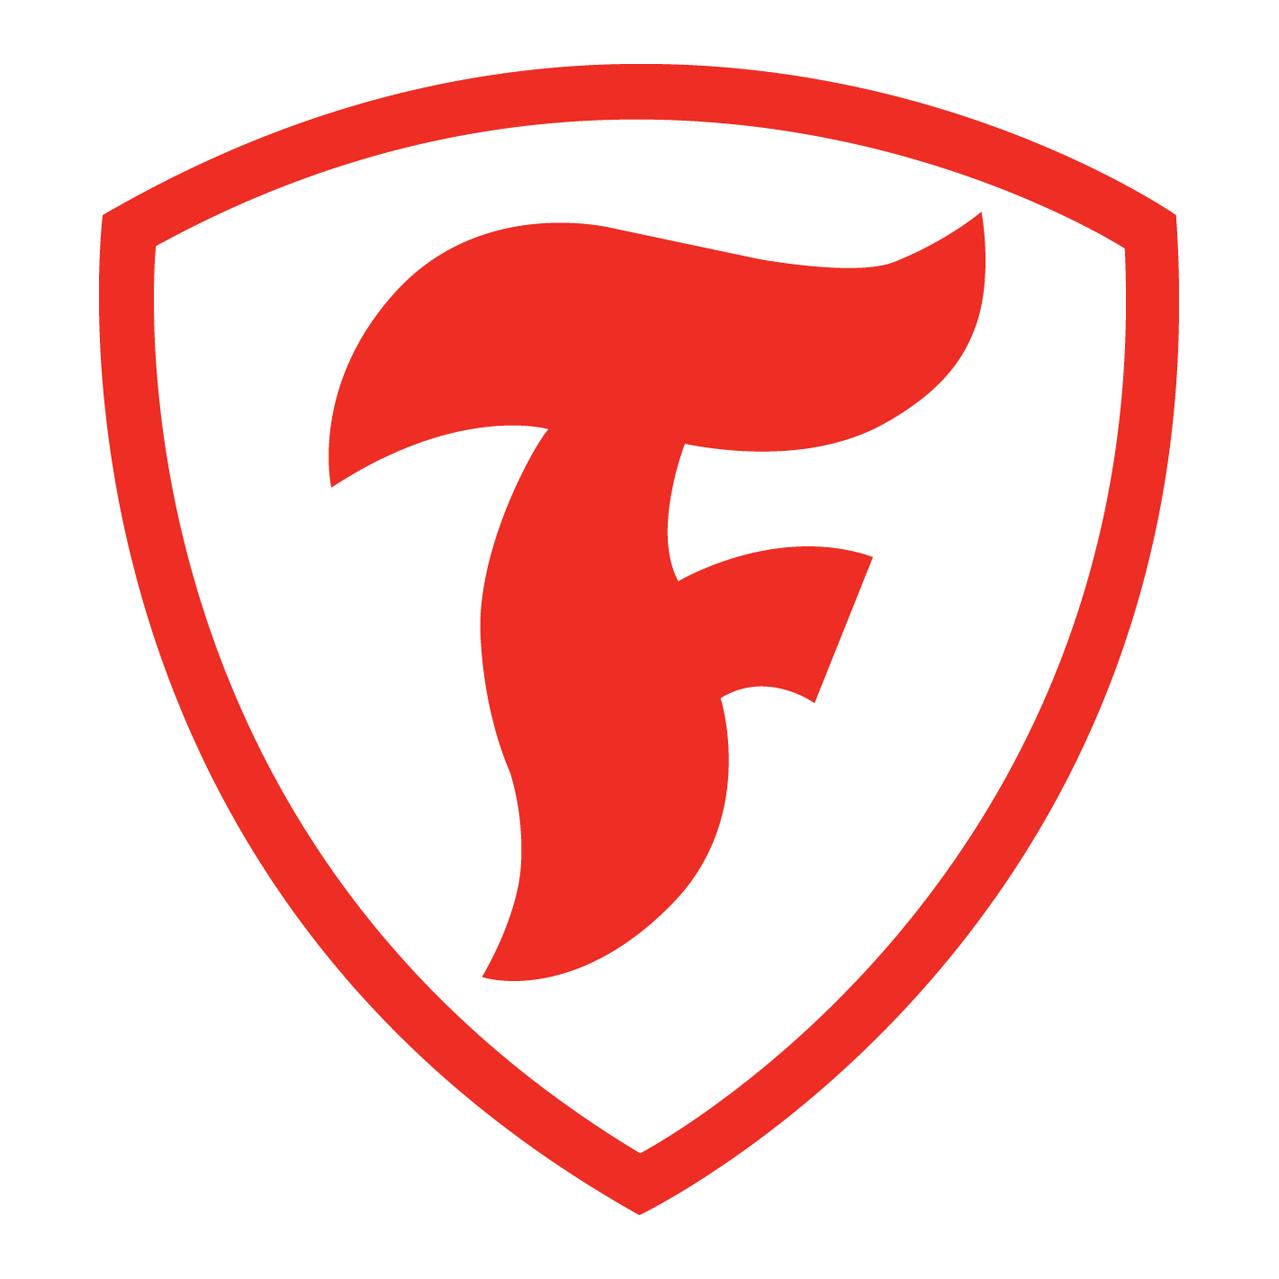 Firestone - Dòng Sản Phẩm Của Bridgestone